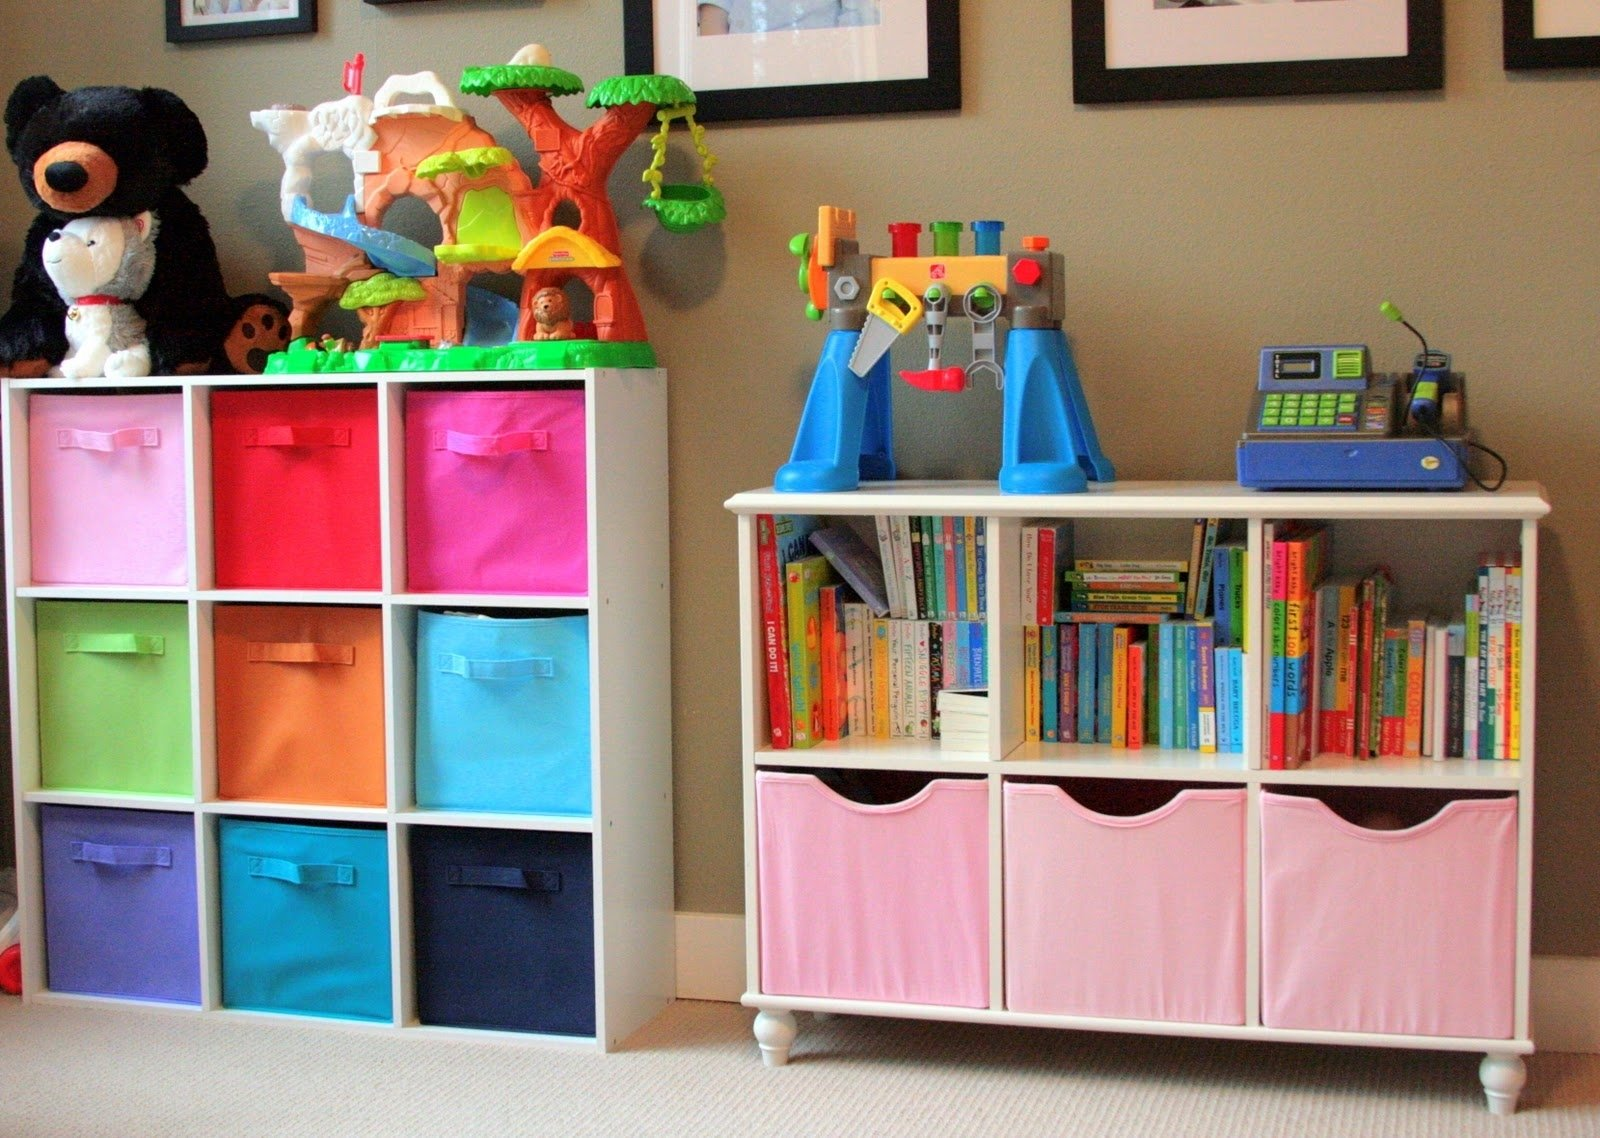 10 Stylish Storage Ideas For Kids Rooms 55 storage for kids room inspiration archive storage ideas for 2020